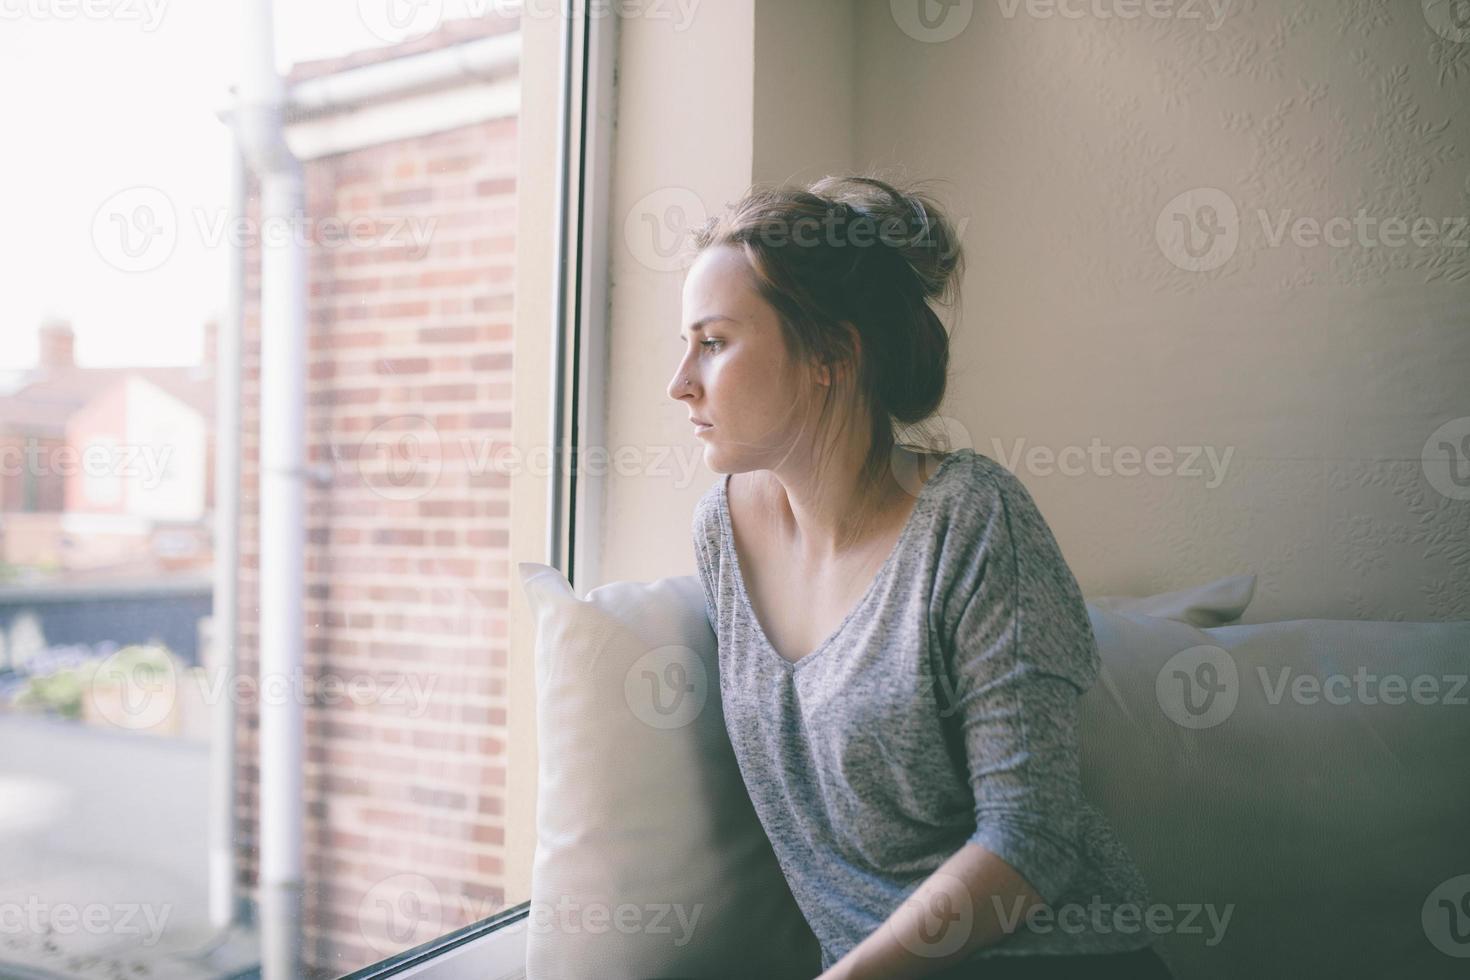 menina loira olhando pela janela foto